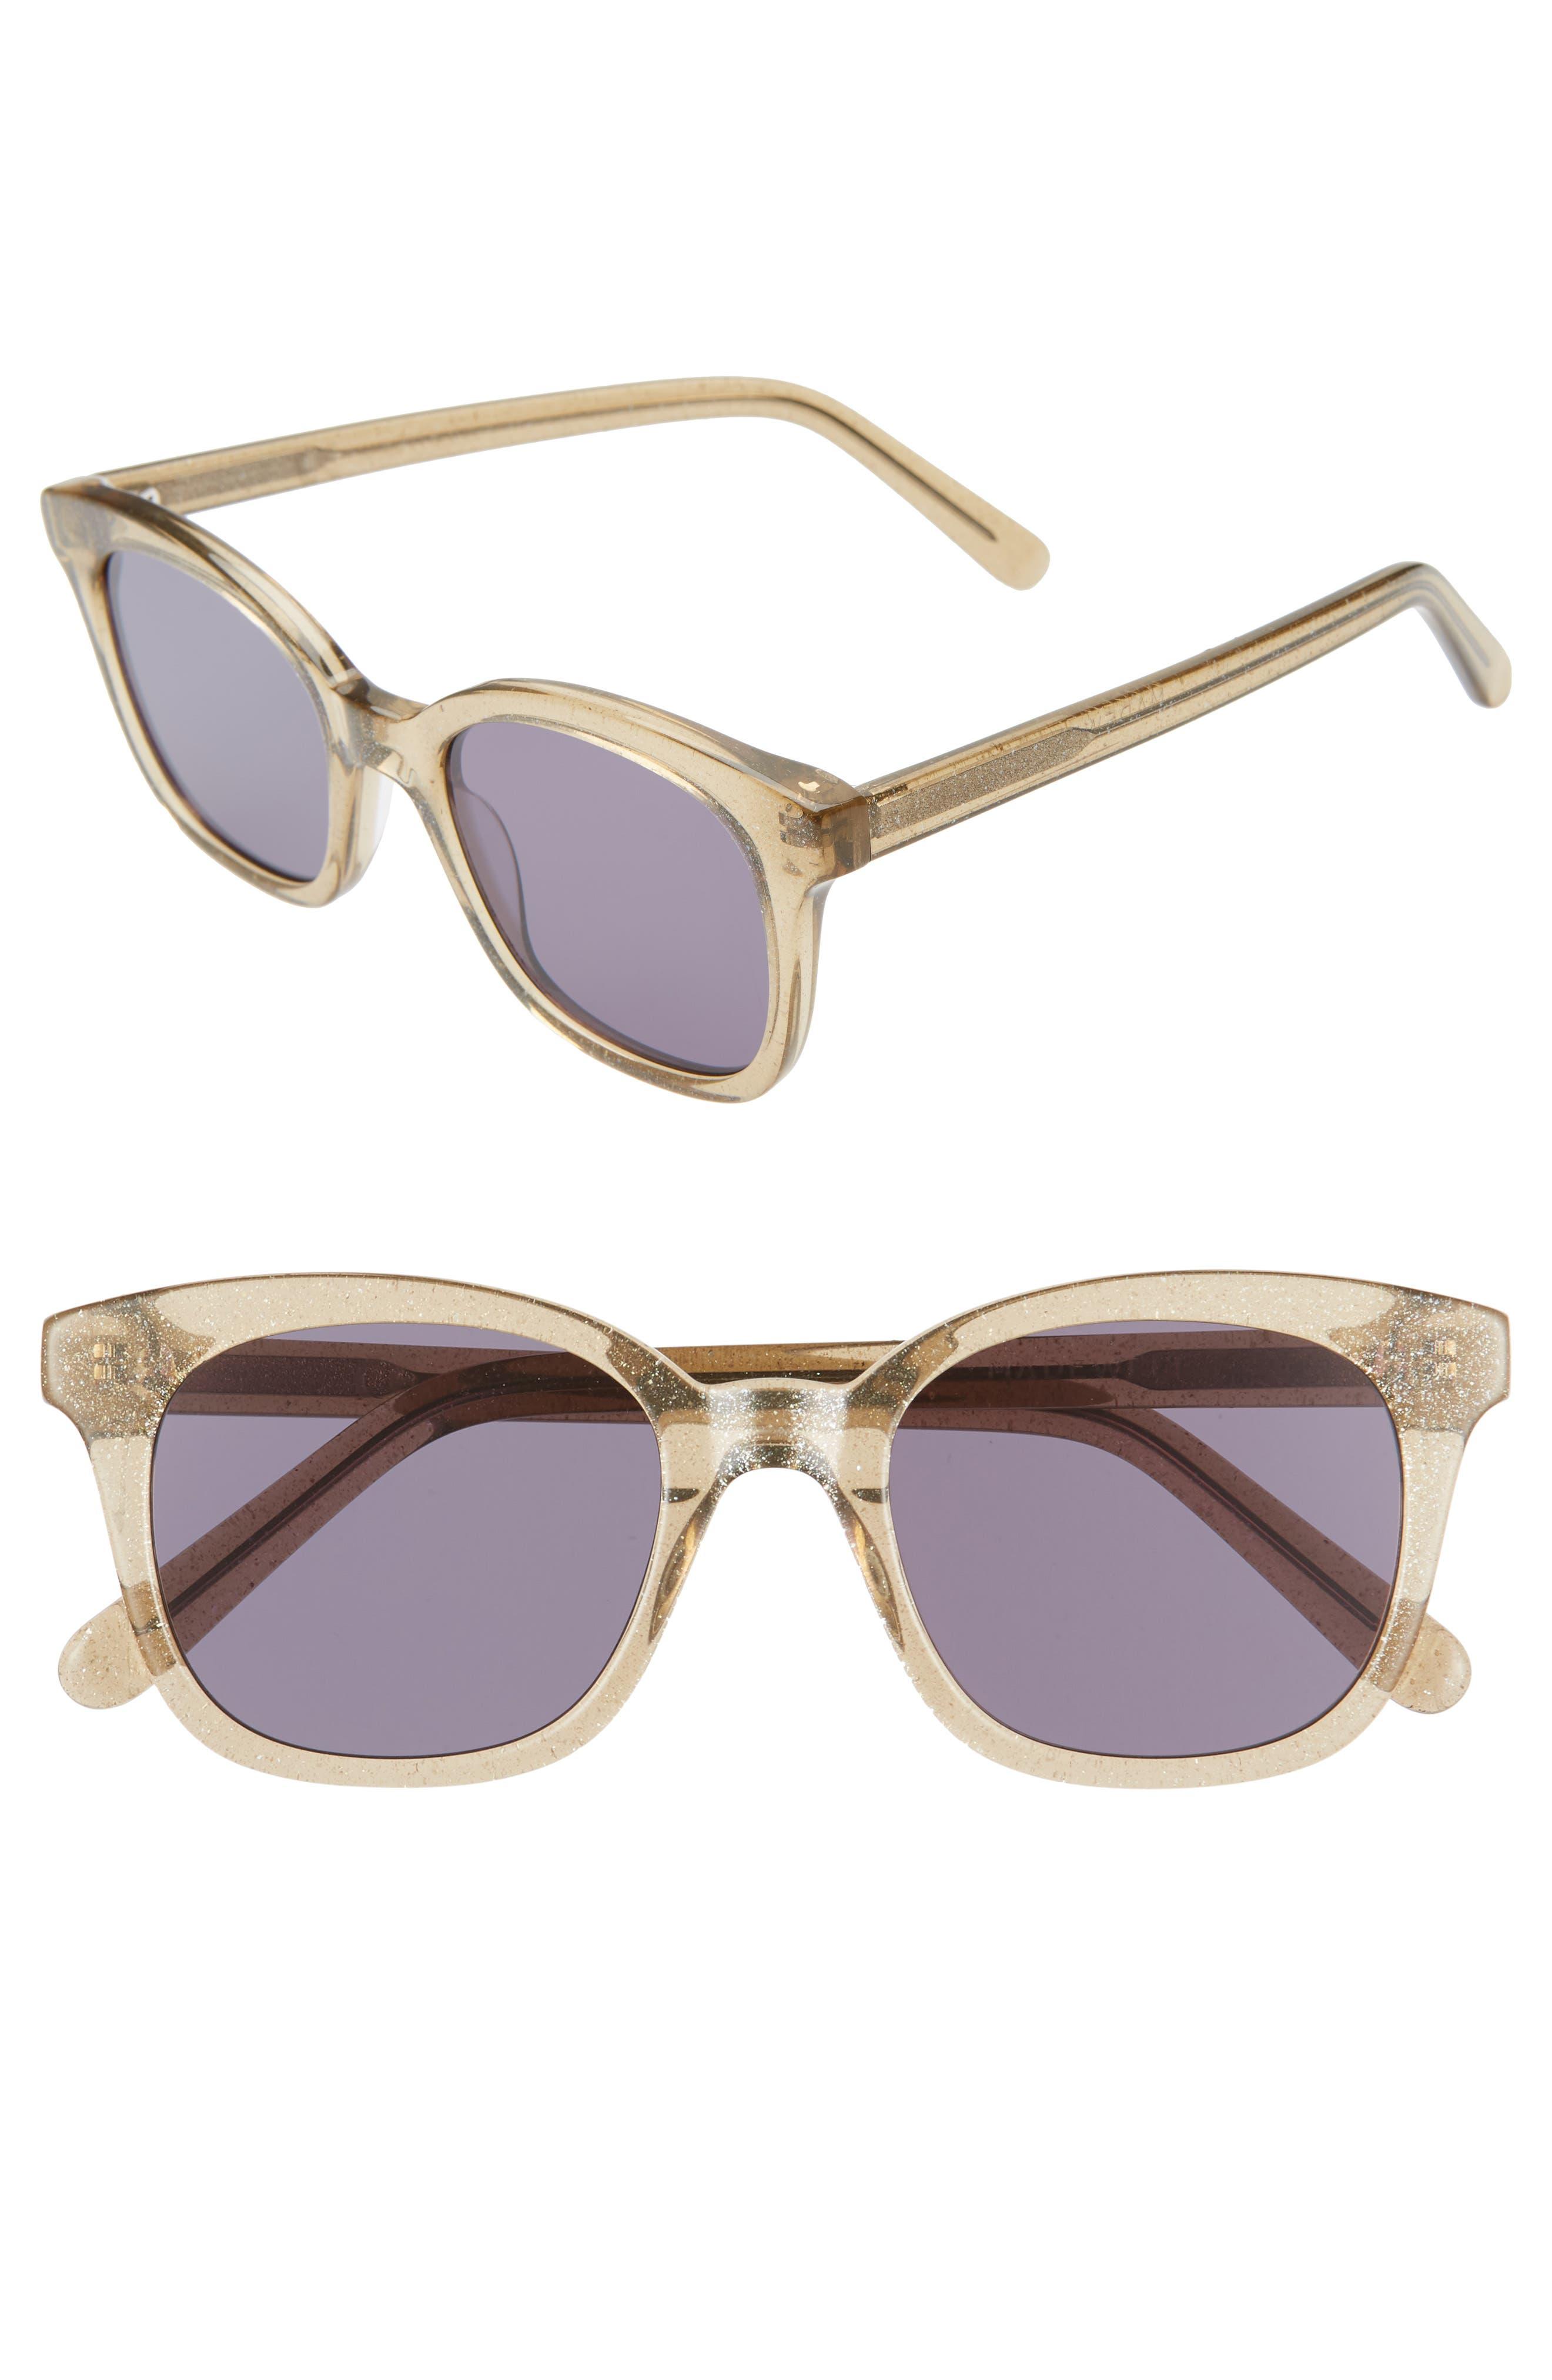 Madewell Venice 4m Flat Frame Sunglasses - Kraft Brown/ Black